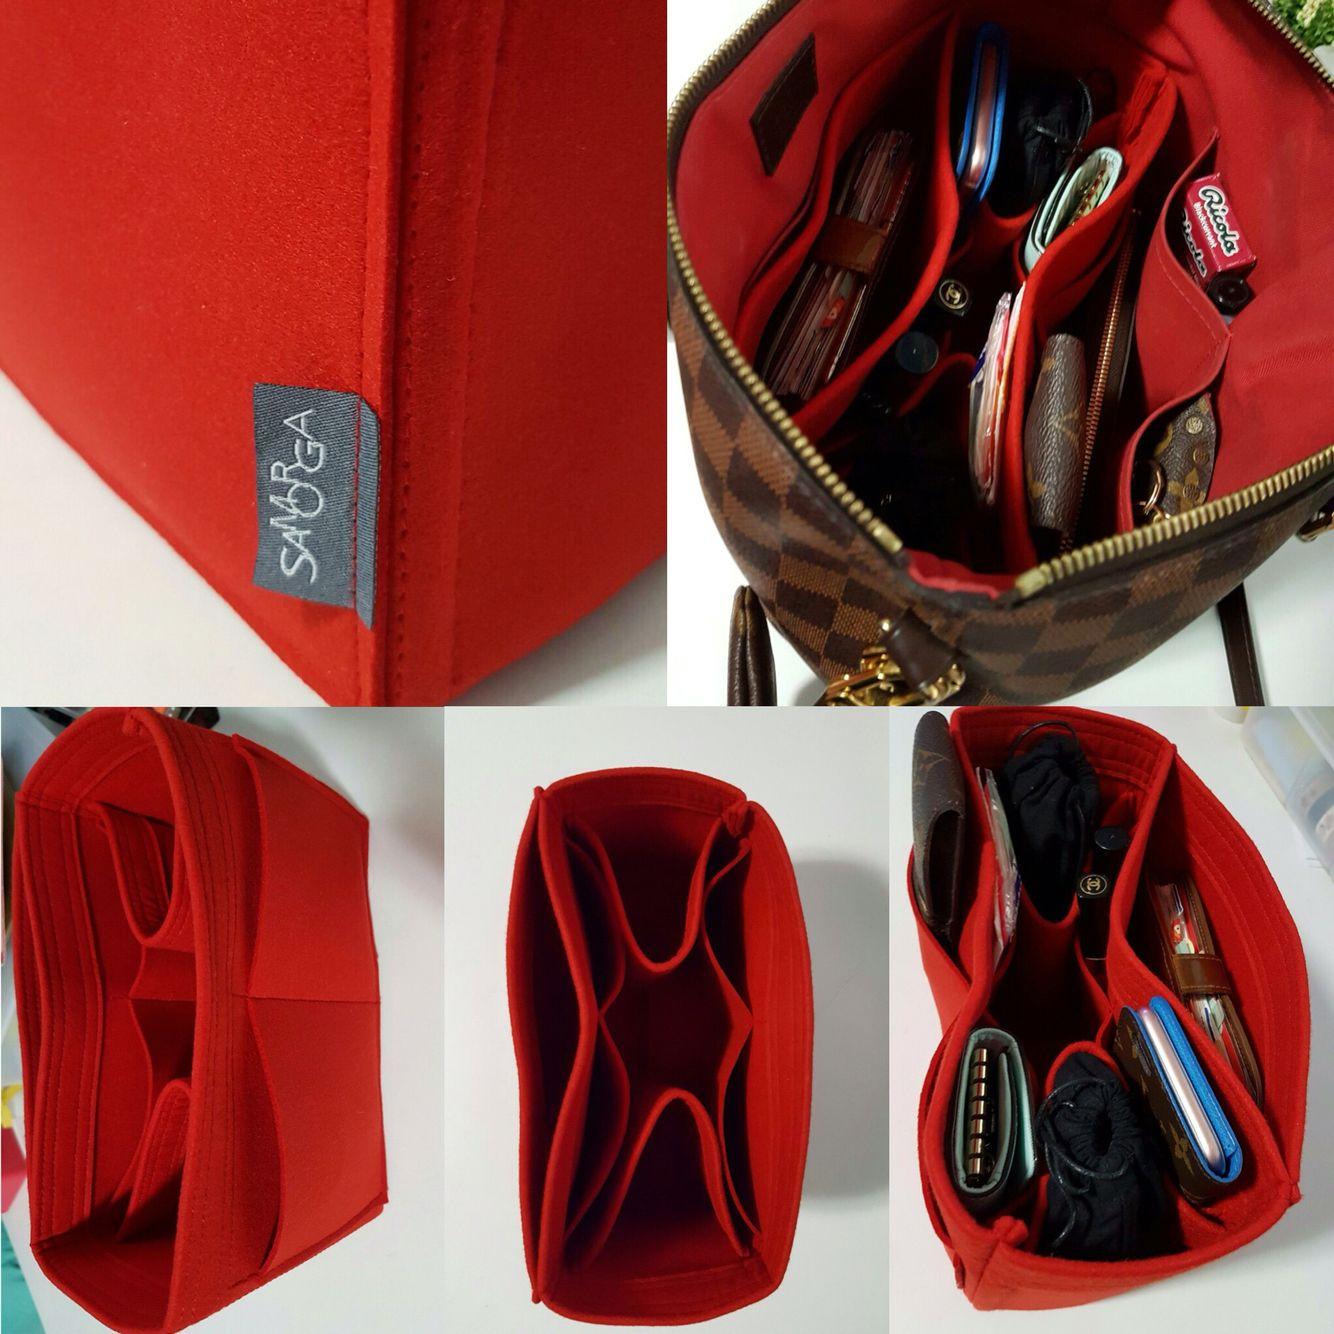 Samorga Felt Bag Organizer On Louis Vuitton Damier Ebene Sienna Mm